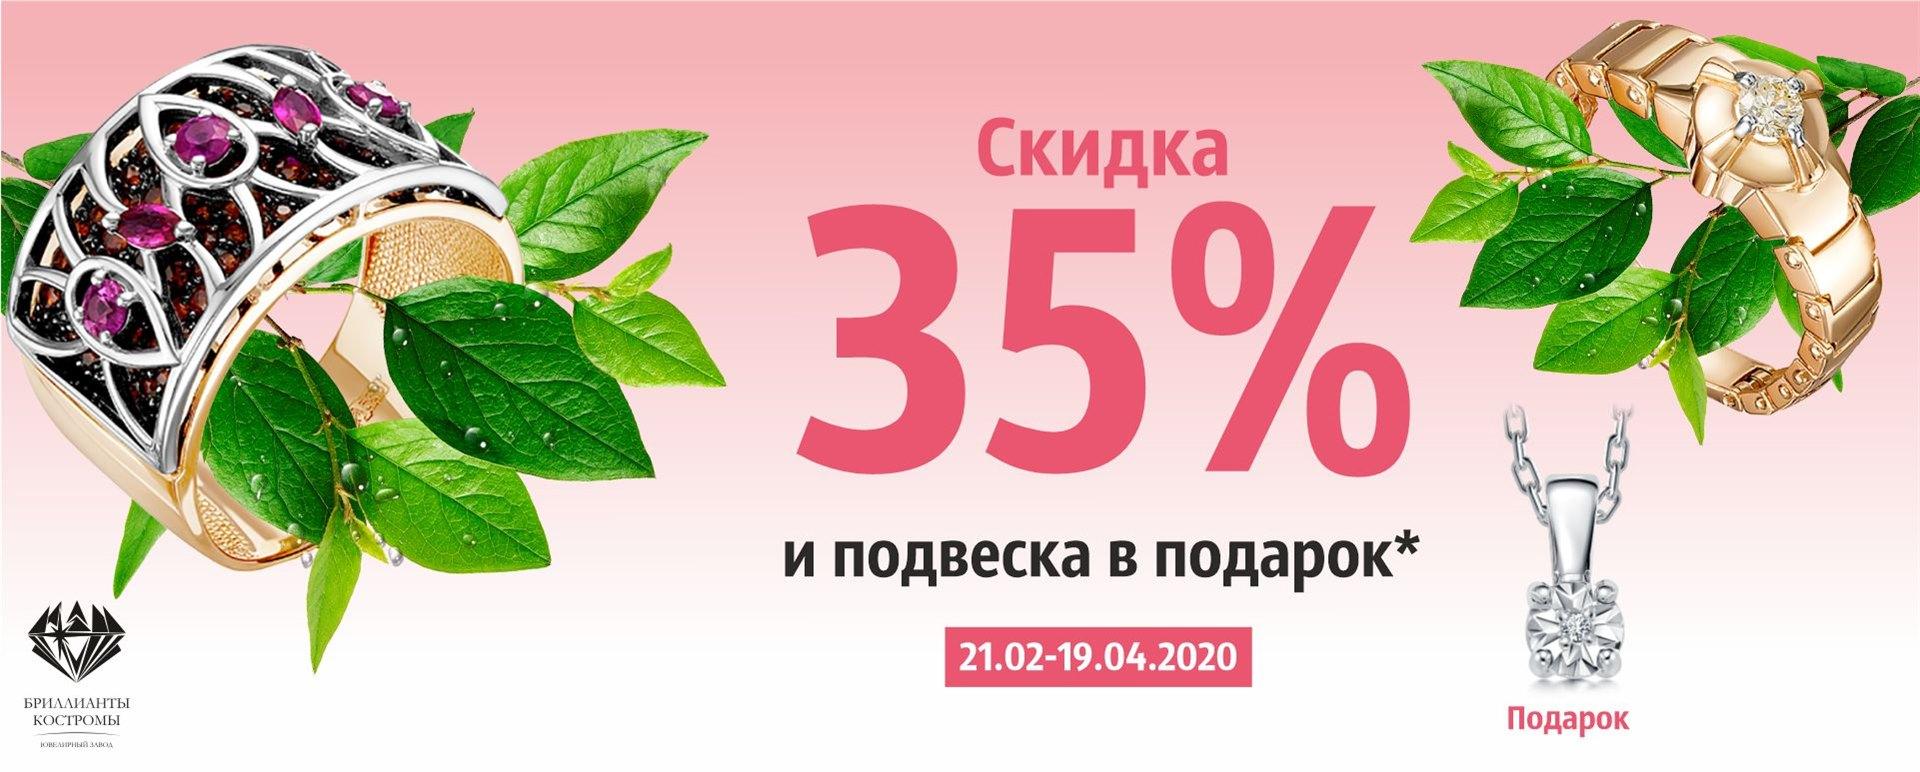 https://www.almazcom.ru/pub/img/Info/24/banner_na_gl_str_brillianty_kostromy.jpg